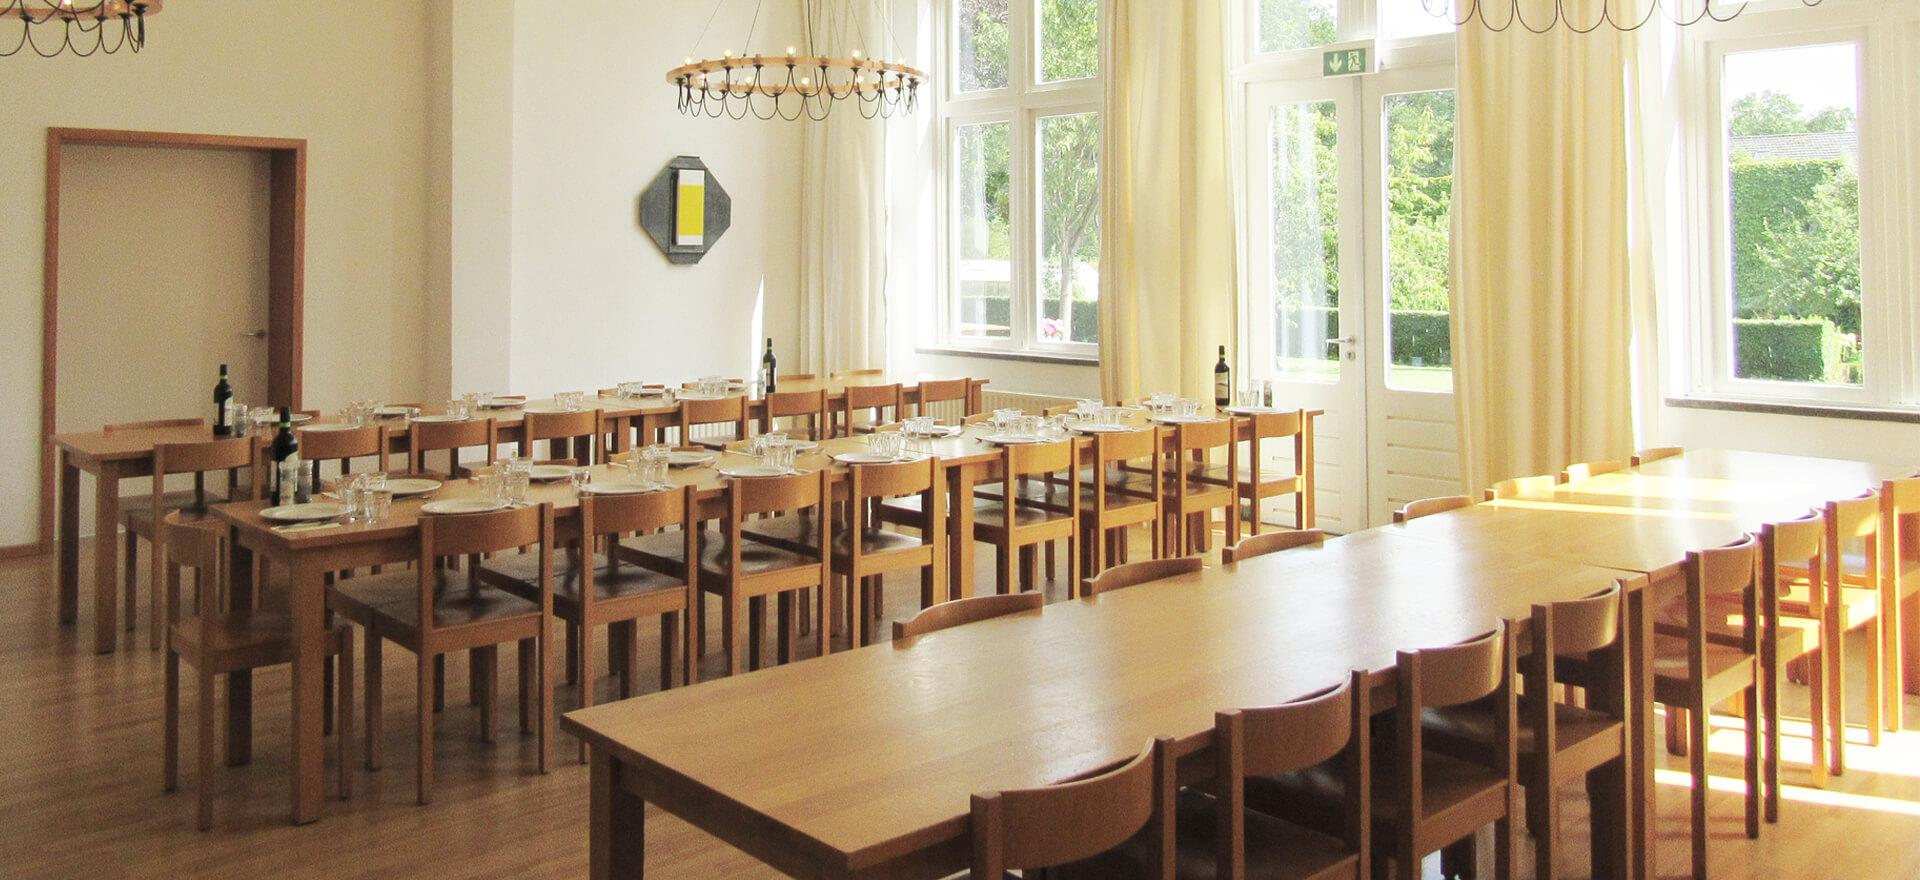 Kloosterhotel ZIN algemene ruimte refter lange kloostertafel